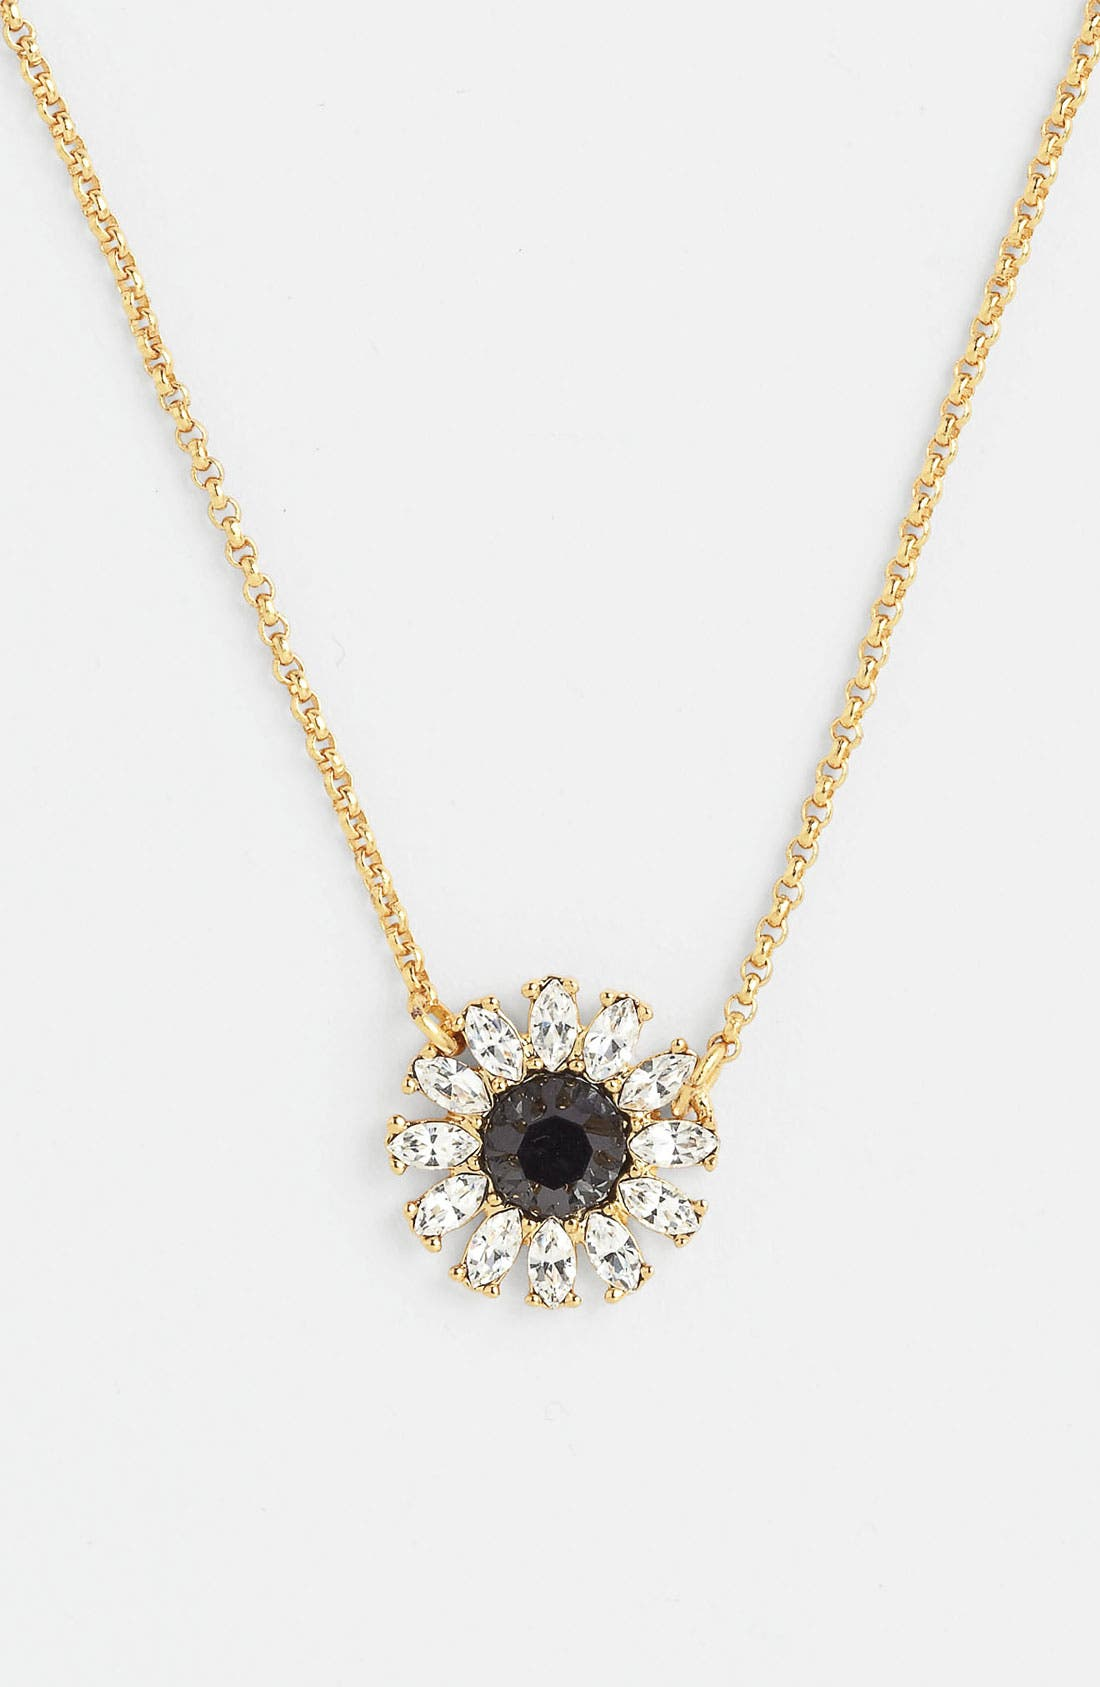 Alternate Image 1 Selected - kate spade new york 'estate garden' pendant necklace